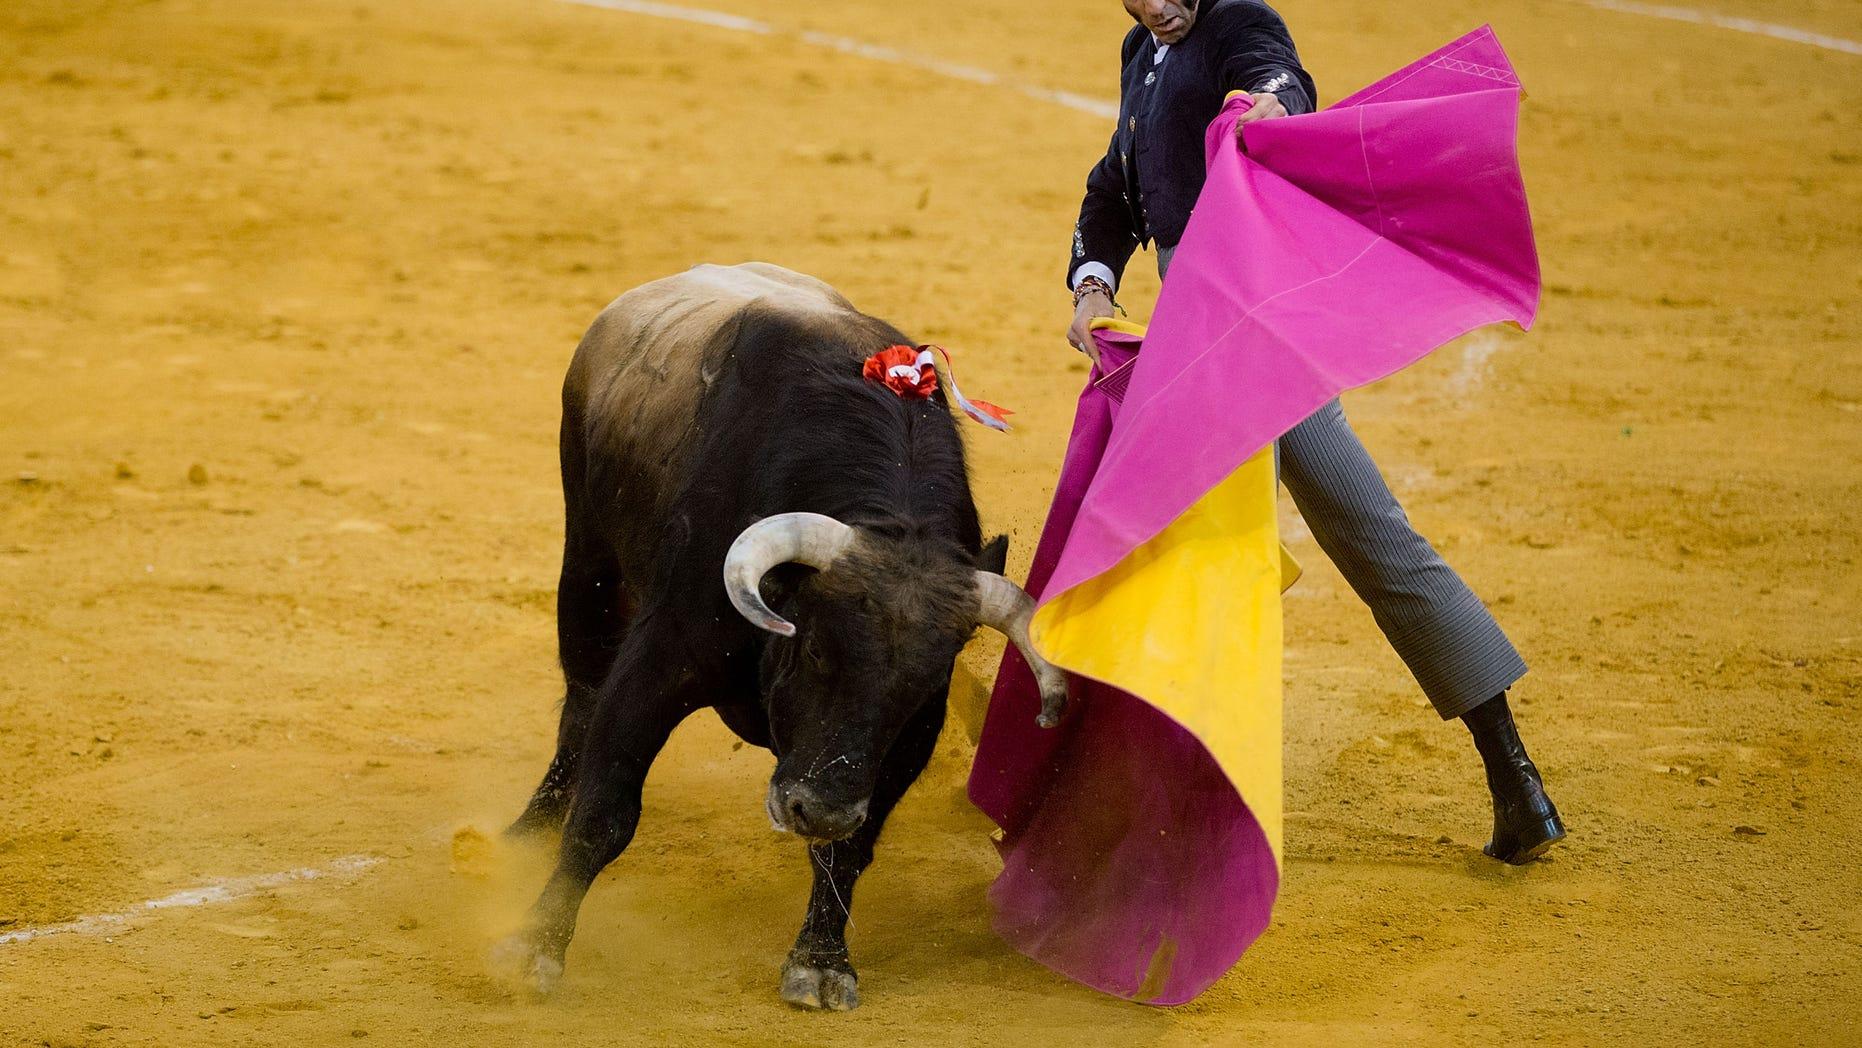 MADRID, SPAIN - MARCH 22:  Spanish bullfighter Juan Jose Padilla performs during  the Bullfighting Charity Festival held in honor of Spanish Banderillero Vicente Yanguez alias El Chano at Palacio Vistalegre Arena bullring on March 22, 2014 in Madrid, Spain.  (Photo by Gonzalo Arroyo Moreno/Getty Images)